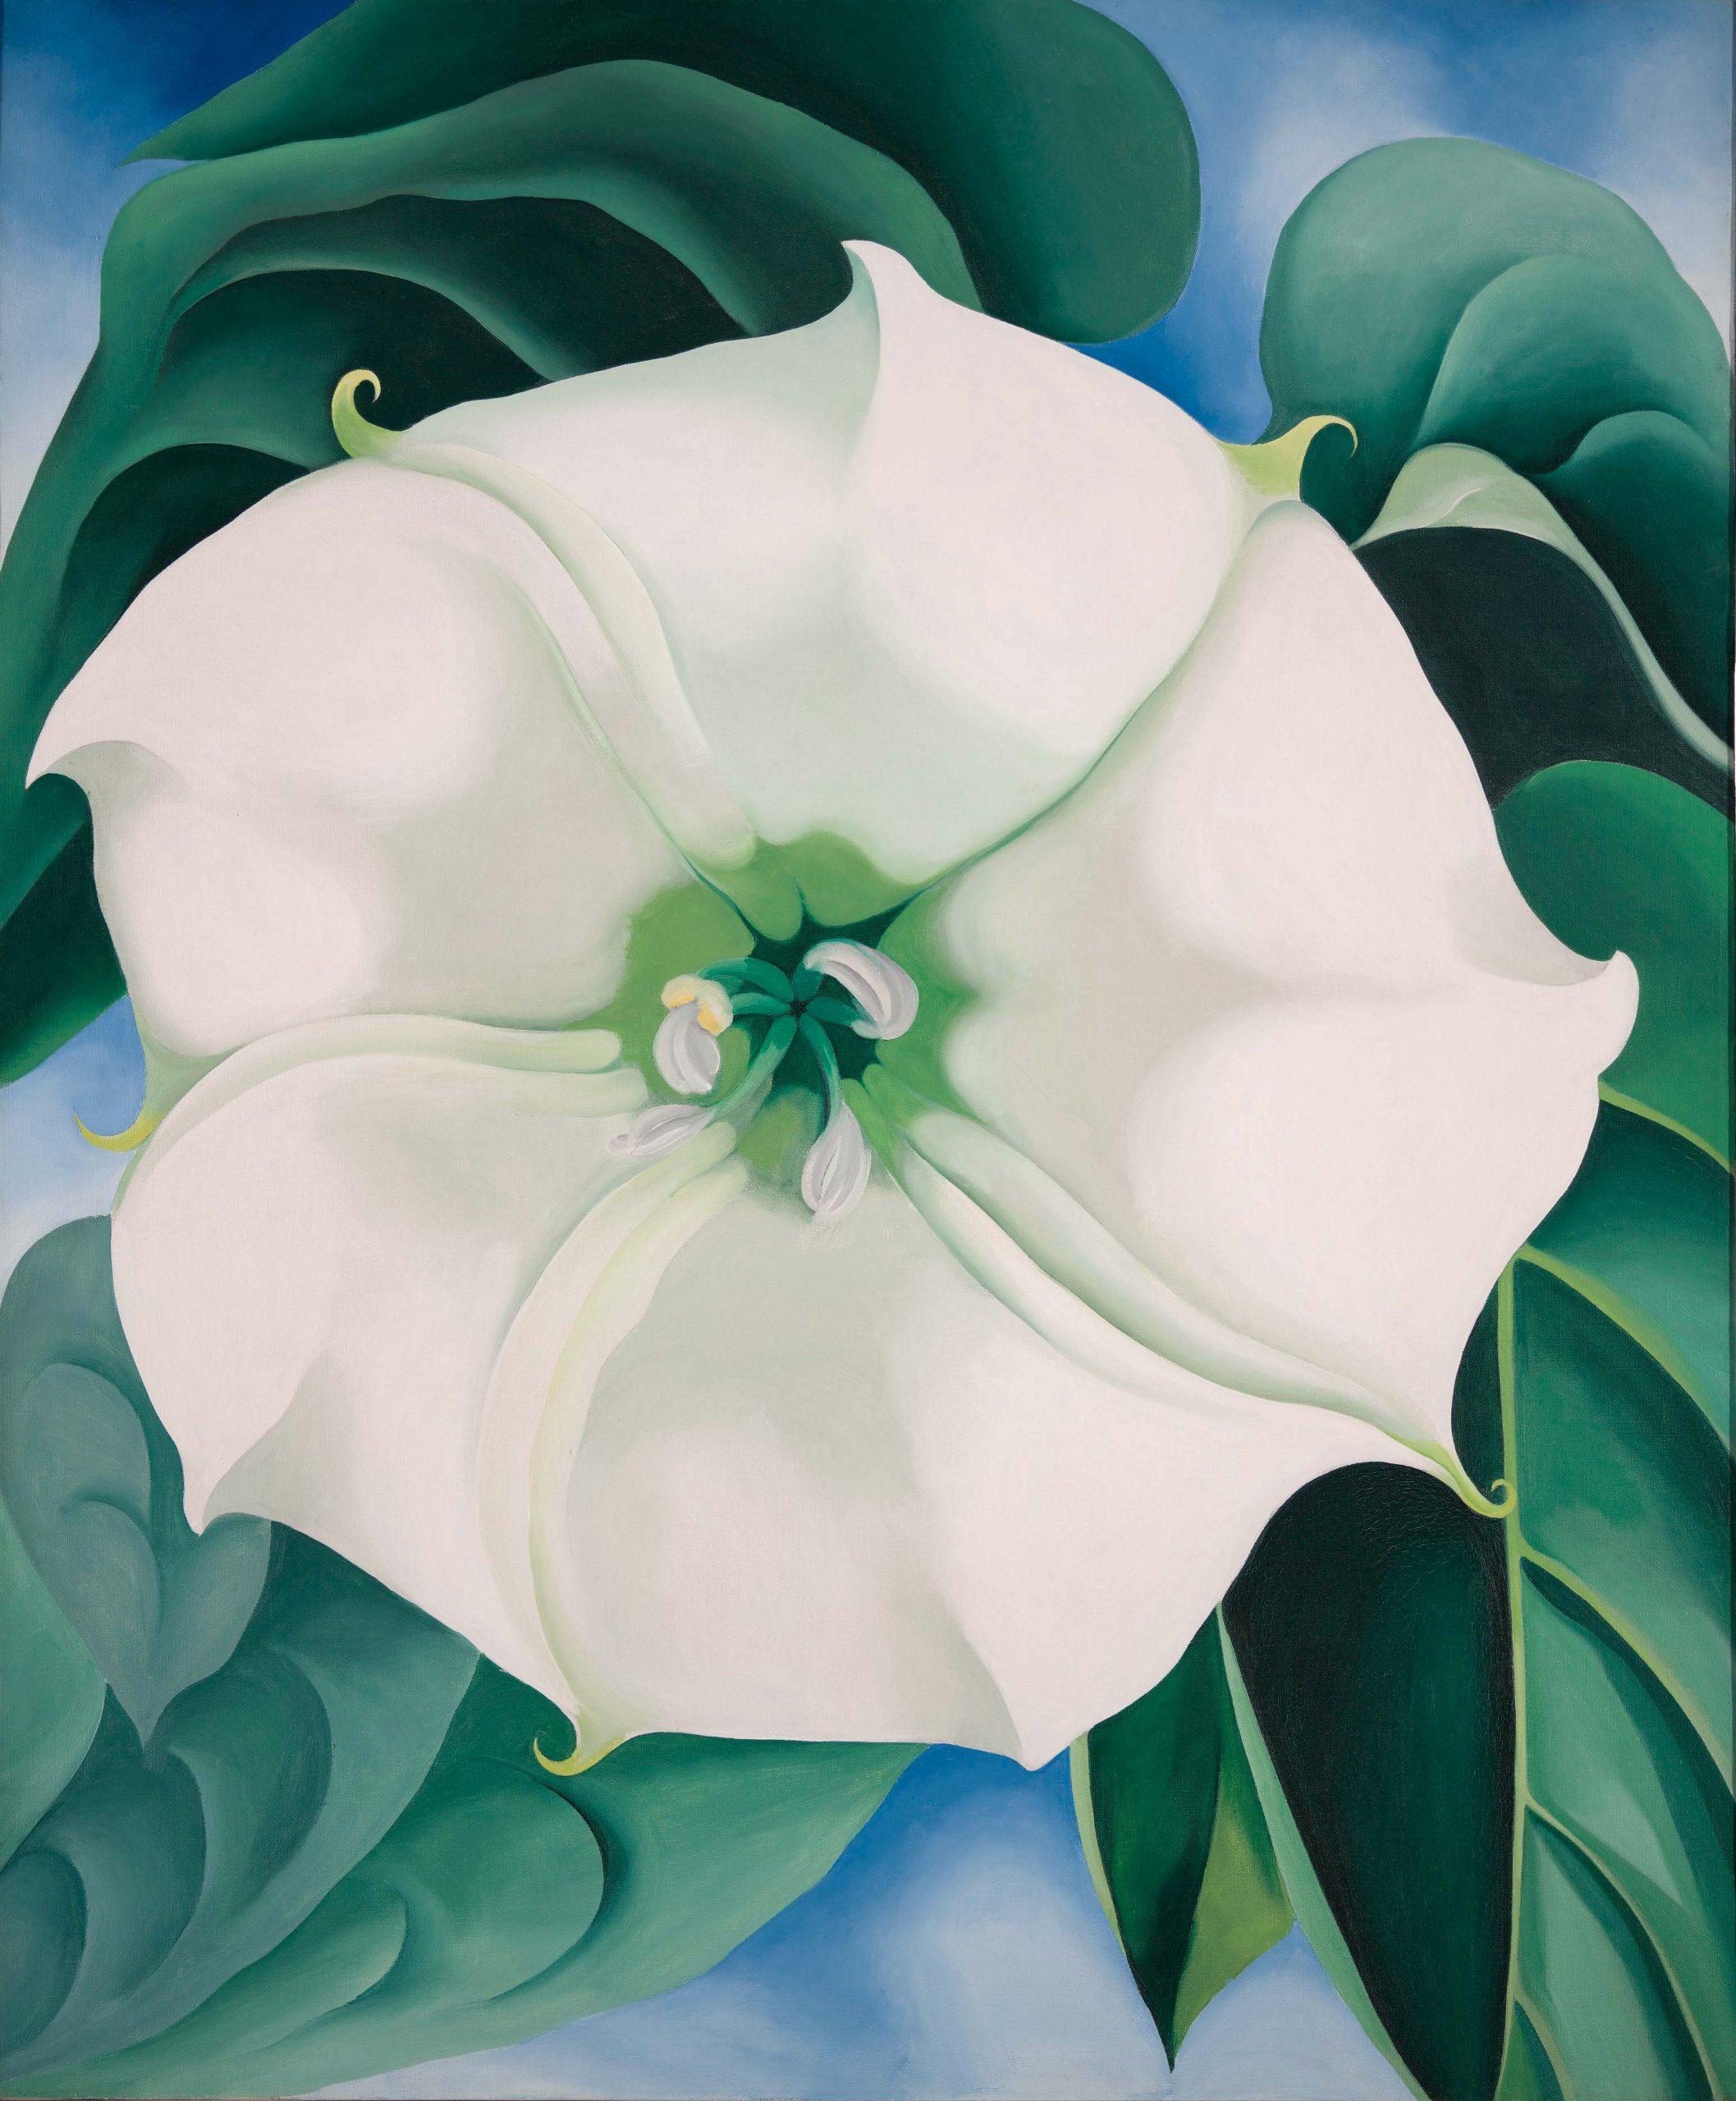 Georgia O'Keeffe Jimson Weed/White Flower No. 1, 1932 Huile sur toile, 121,9 × 101,6 cm Crystal Bridges Museum of Art, Bentonville, Arkansas American © Crystal Bridges Museum of American Art. Photography by Edward C. Robison III  © Georgia O'Keeffe Museum / Adagp, Paris, 2021